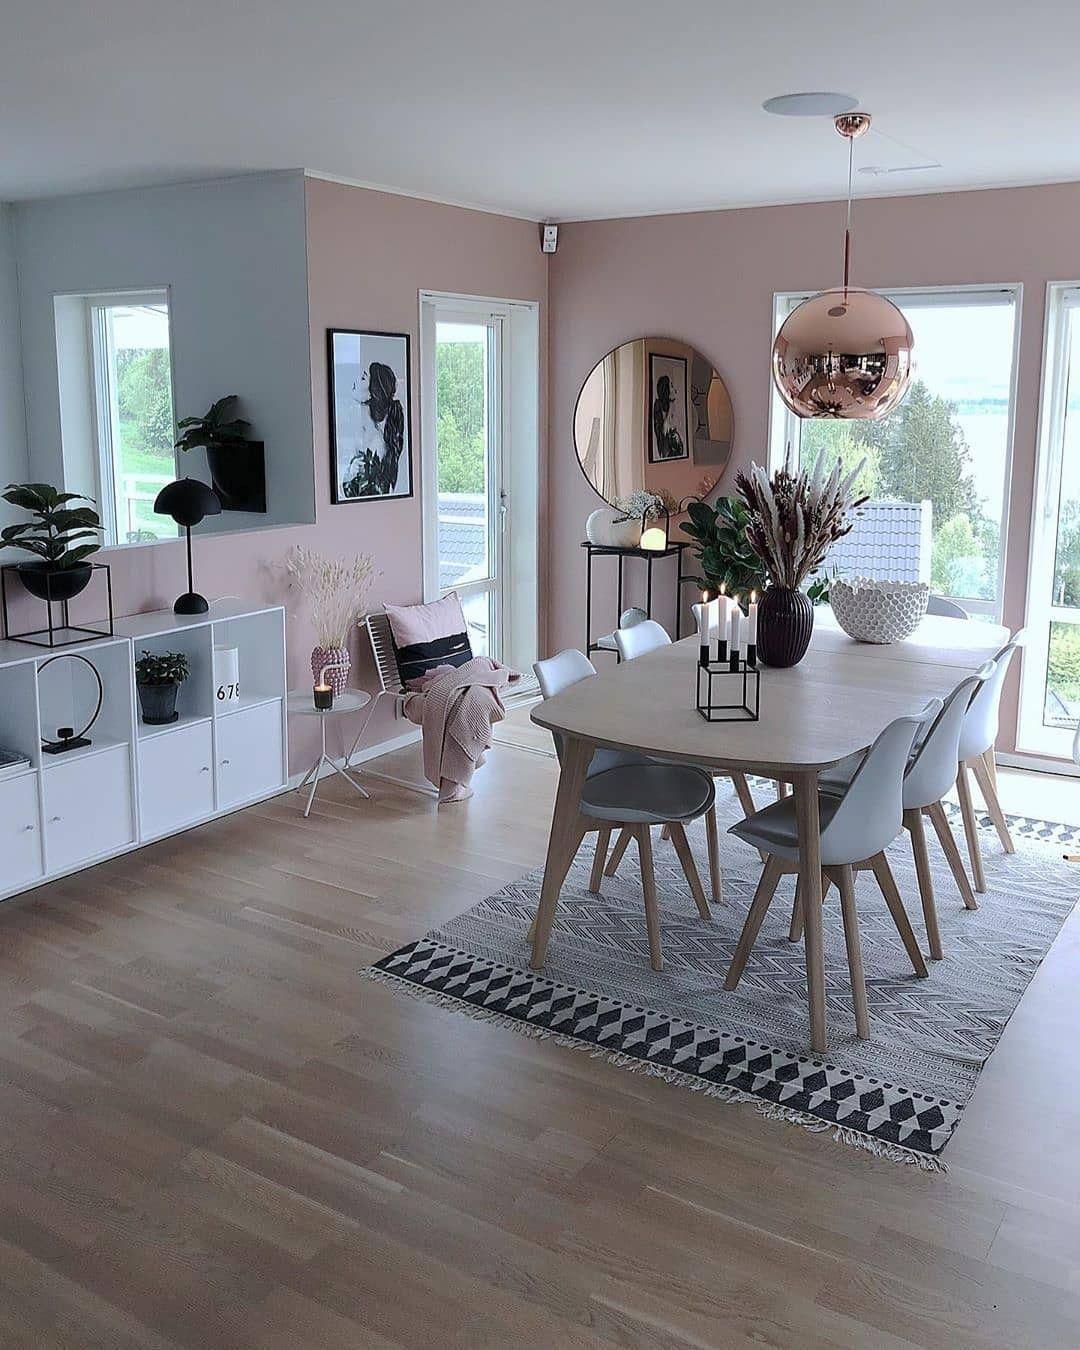 Interior Design Home Decor On Instagram Follow Us Interiorsandecor For More Daily Home Design Inspo Our Home Decor Online Home Decor Stores Home